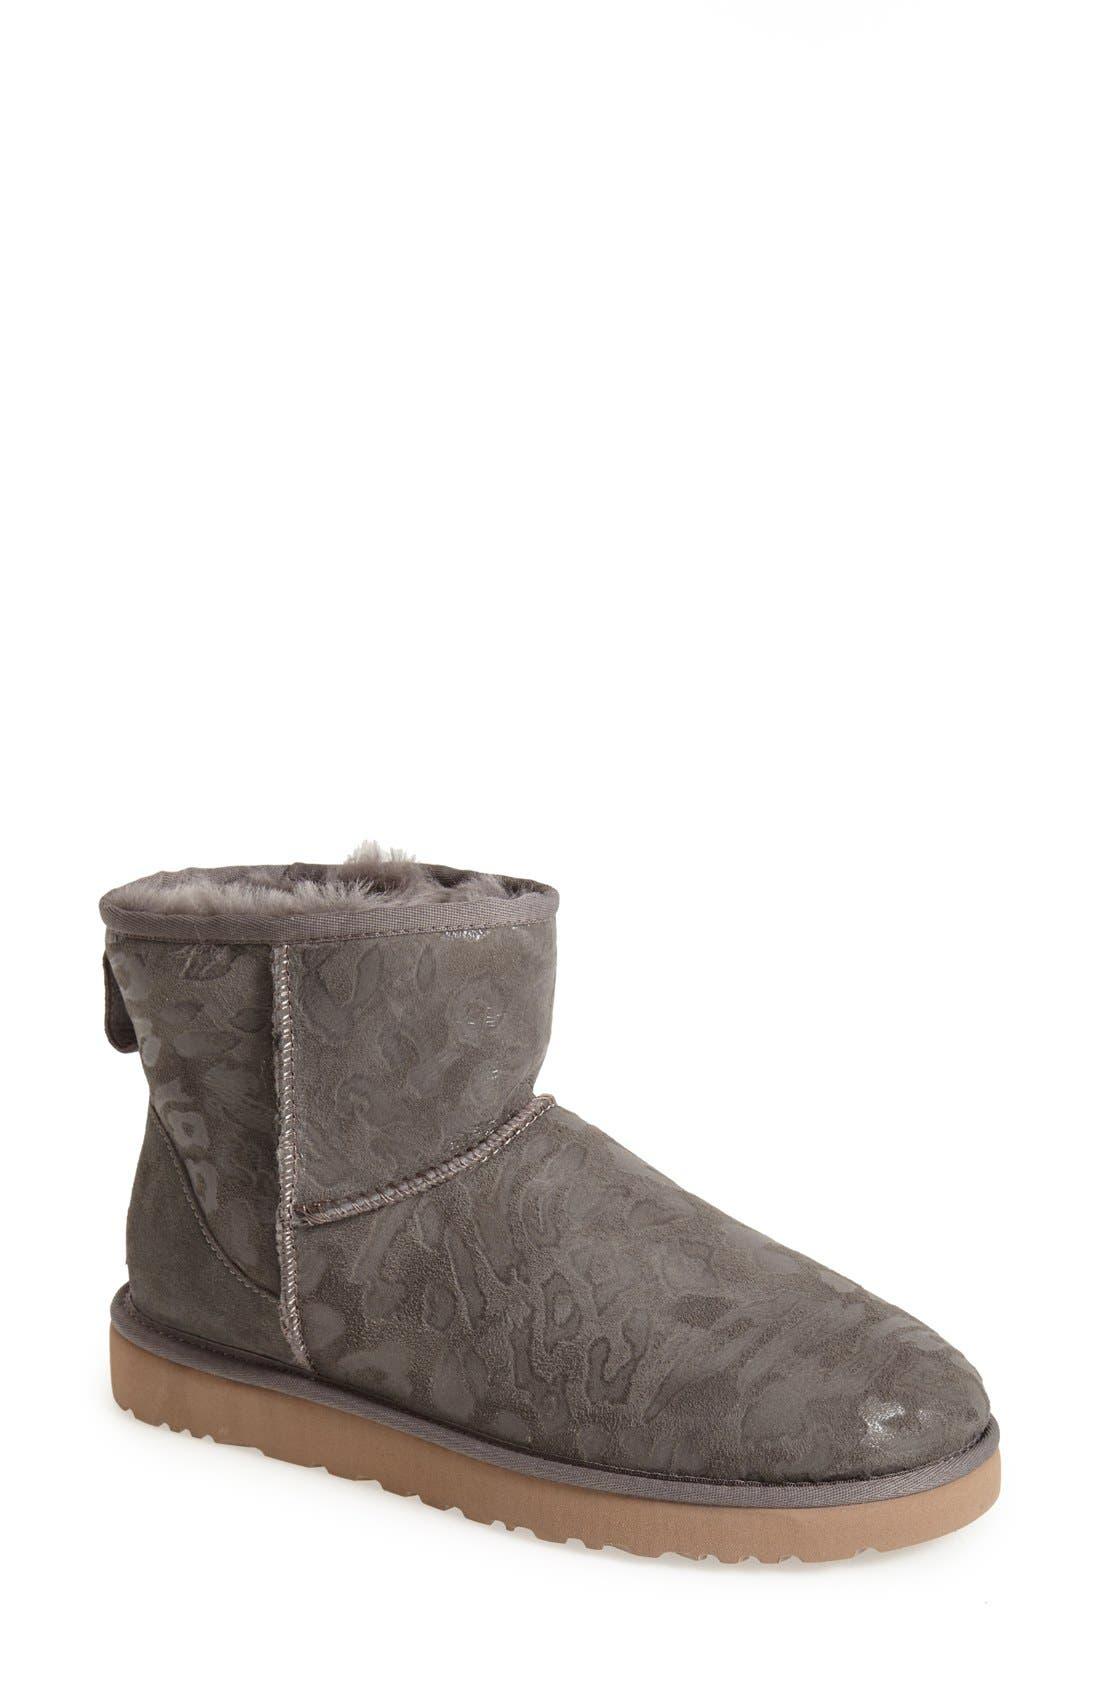 UGG<SUP>®</SUP> Australia 'Classic Mini Leopard' Boot, Main, color, 020